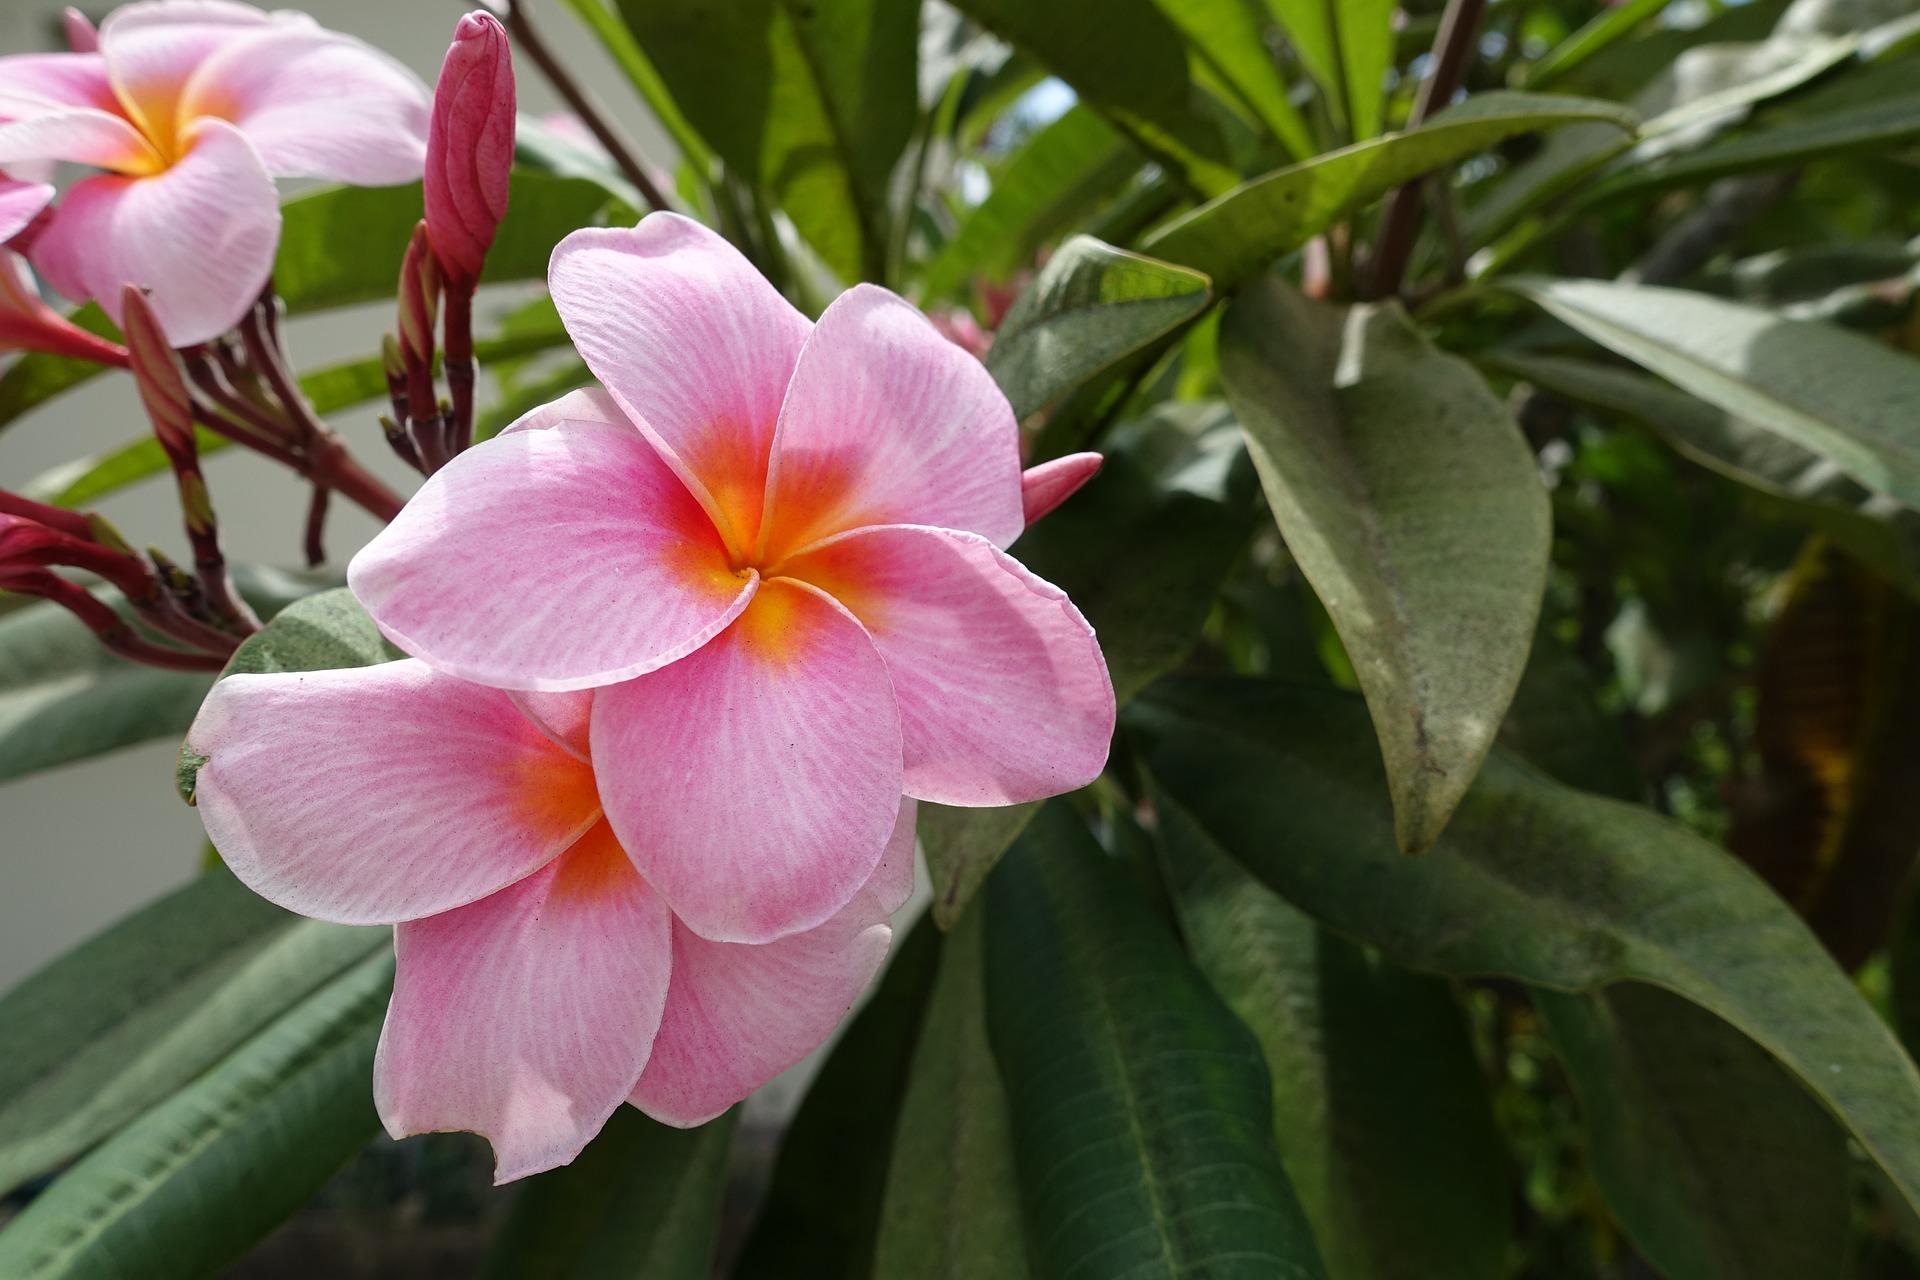 Madeiras wundervolle Blüten